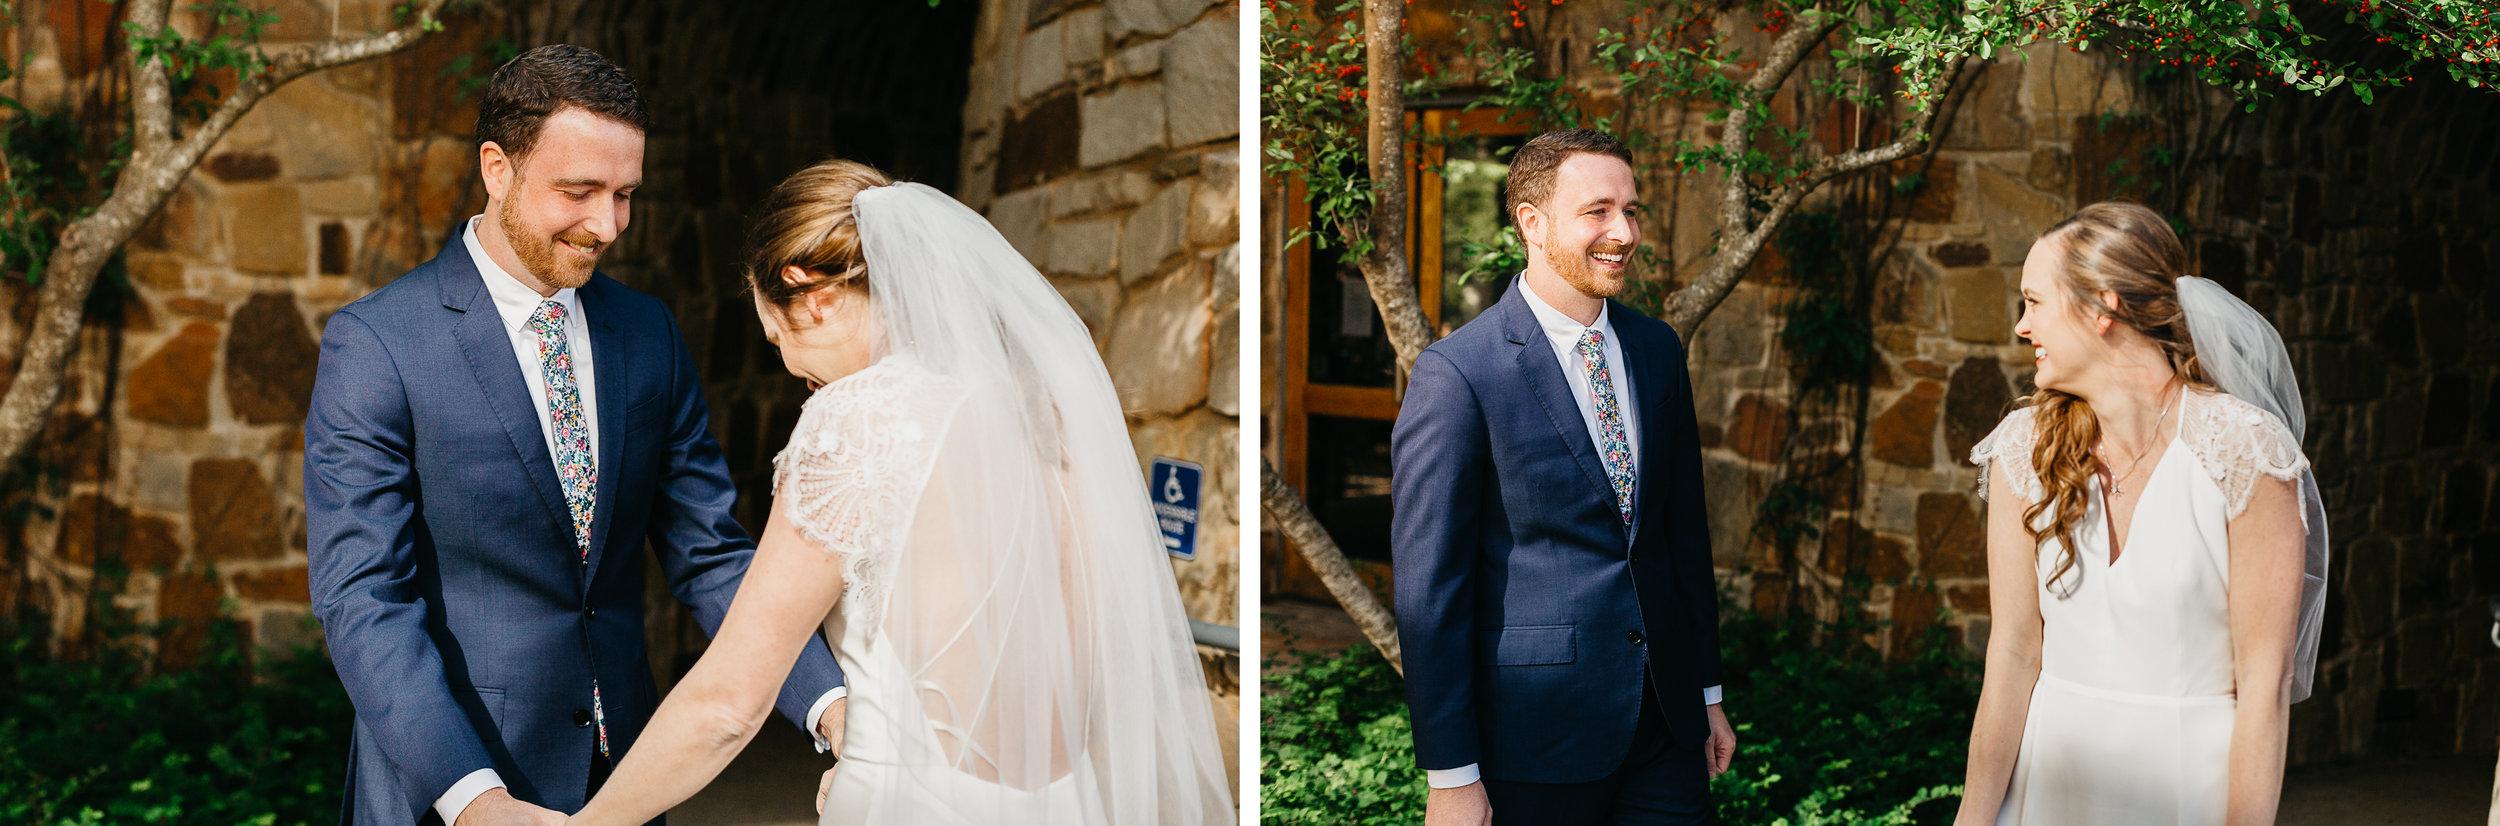 Austin Wedding Photographer Lady Bird Johnson Wildflower Center Wedding 2.jpg